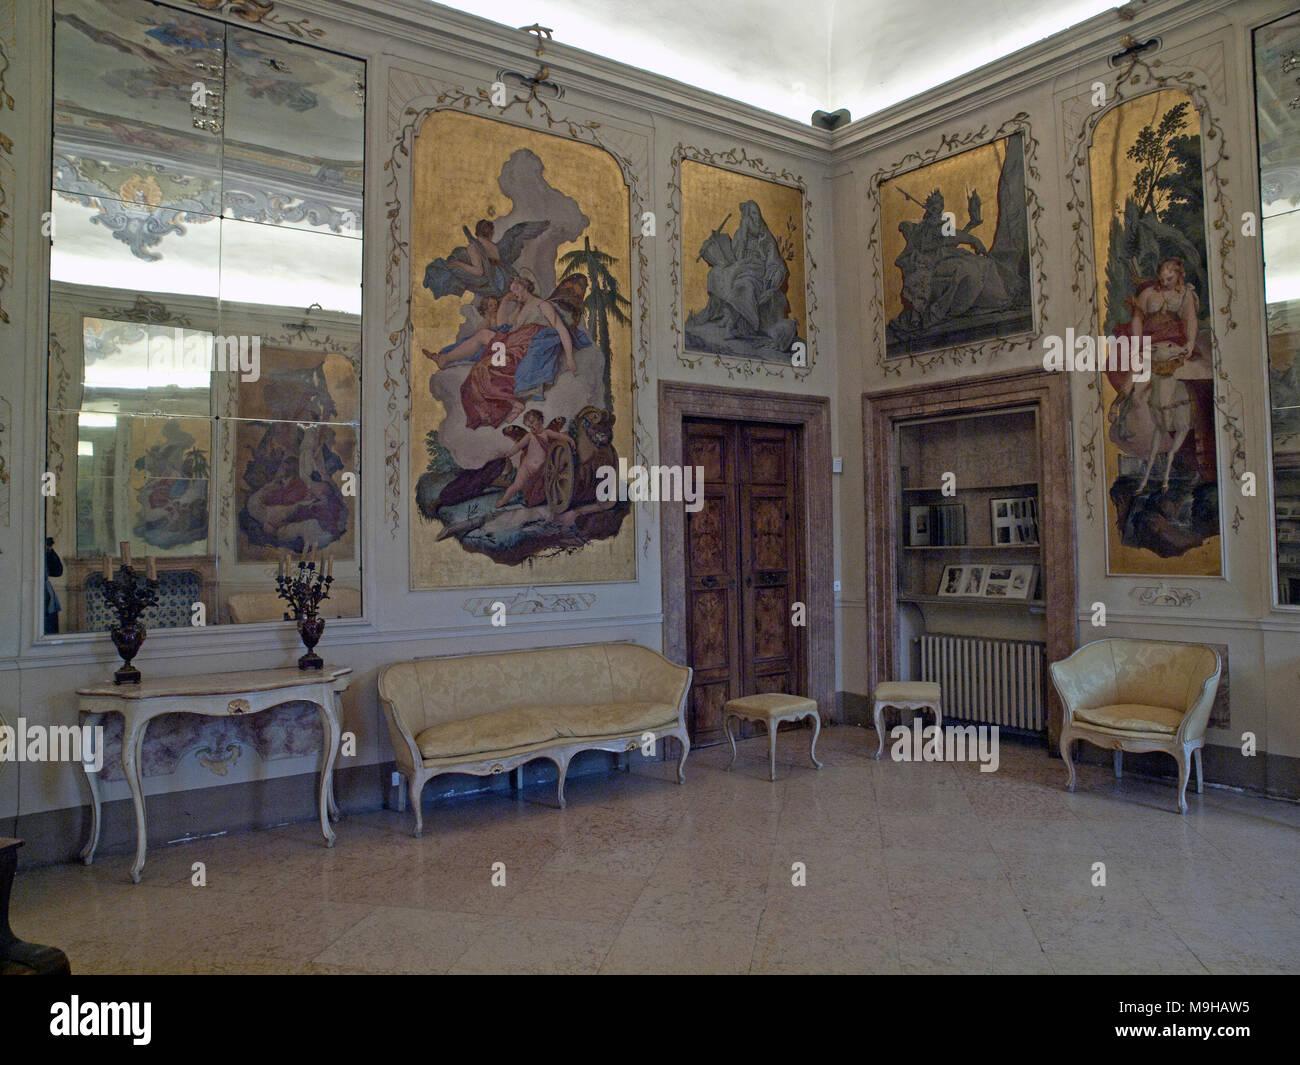 Gli eleganti interni del palazzo giardino giusti verona for Giardino e palazzo giusti